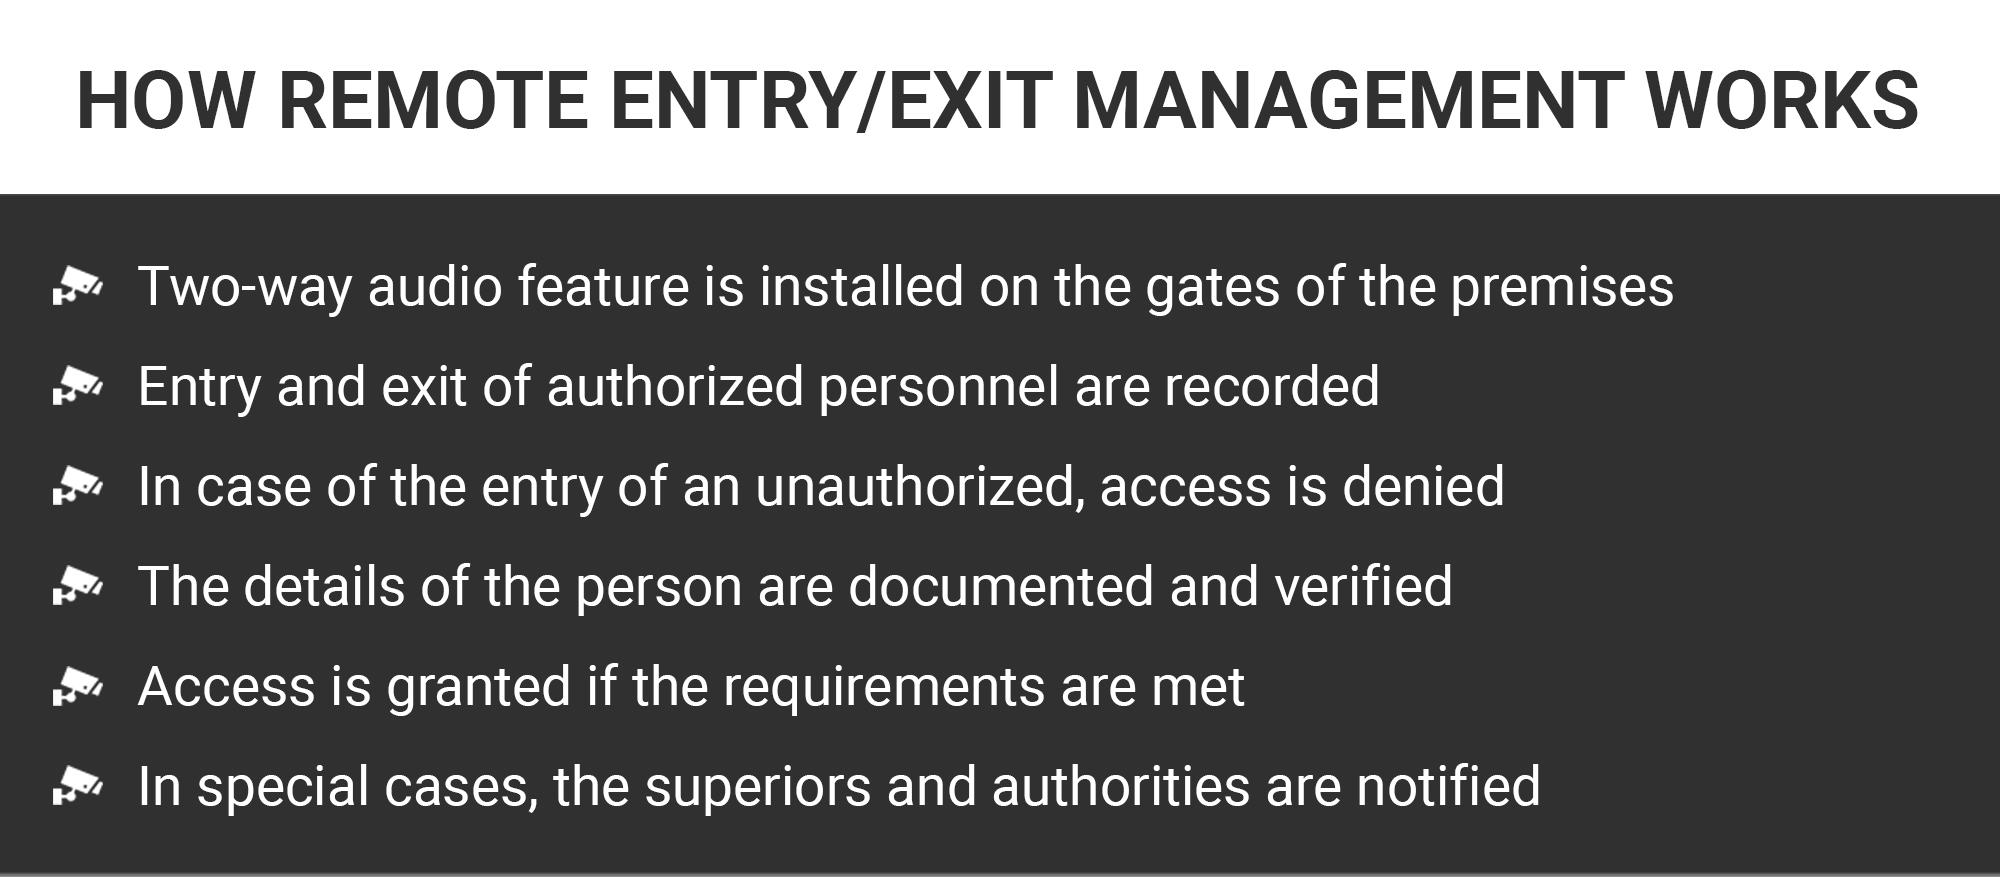 Remote Entry/Exit Management